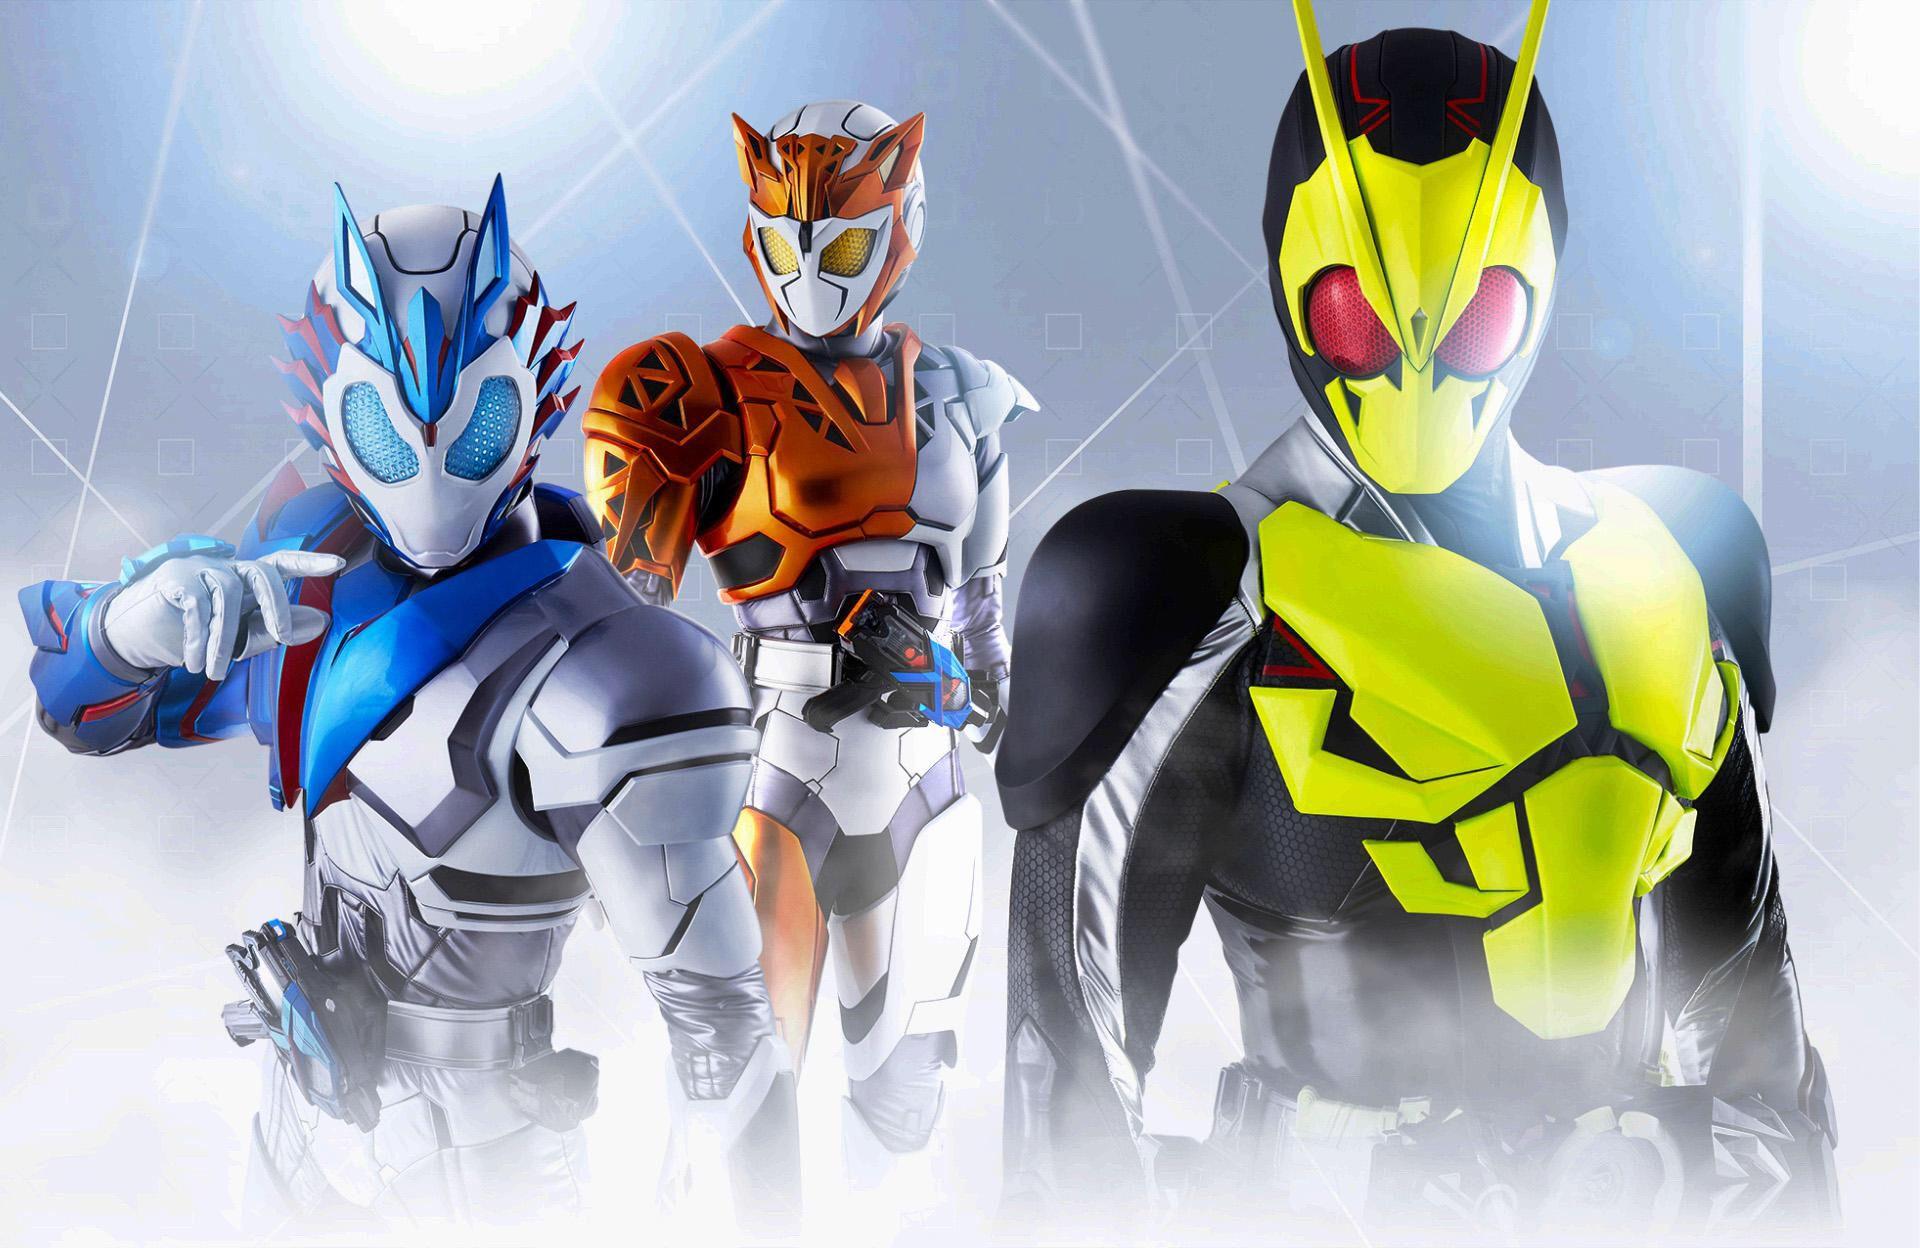 Kamen Rider Zero One Kamen Rider Vulcan Kamen Rider Valkyrie Kamen Rider Kamen Rider Decade Kamen Rider Kabuto